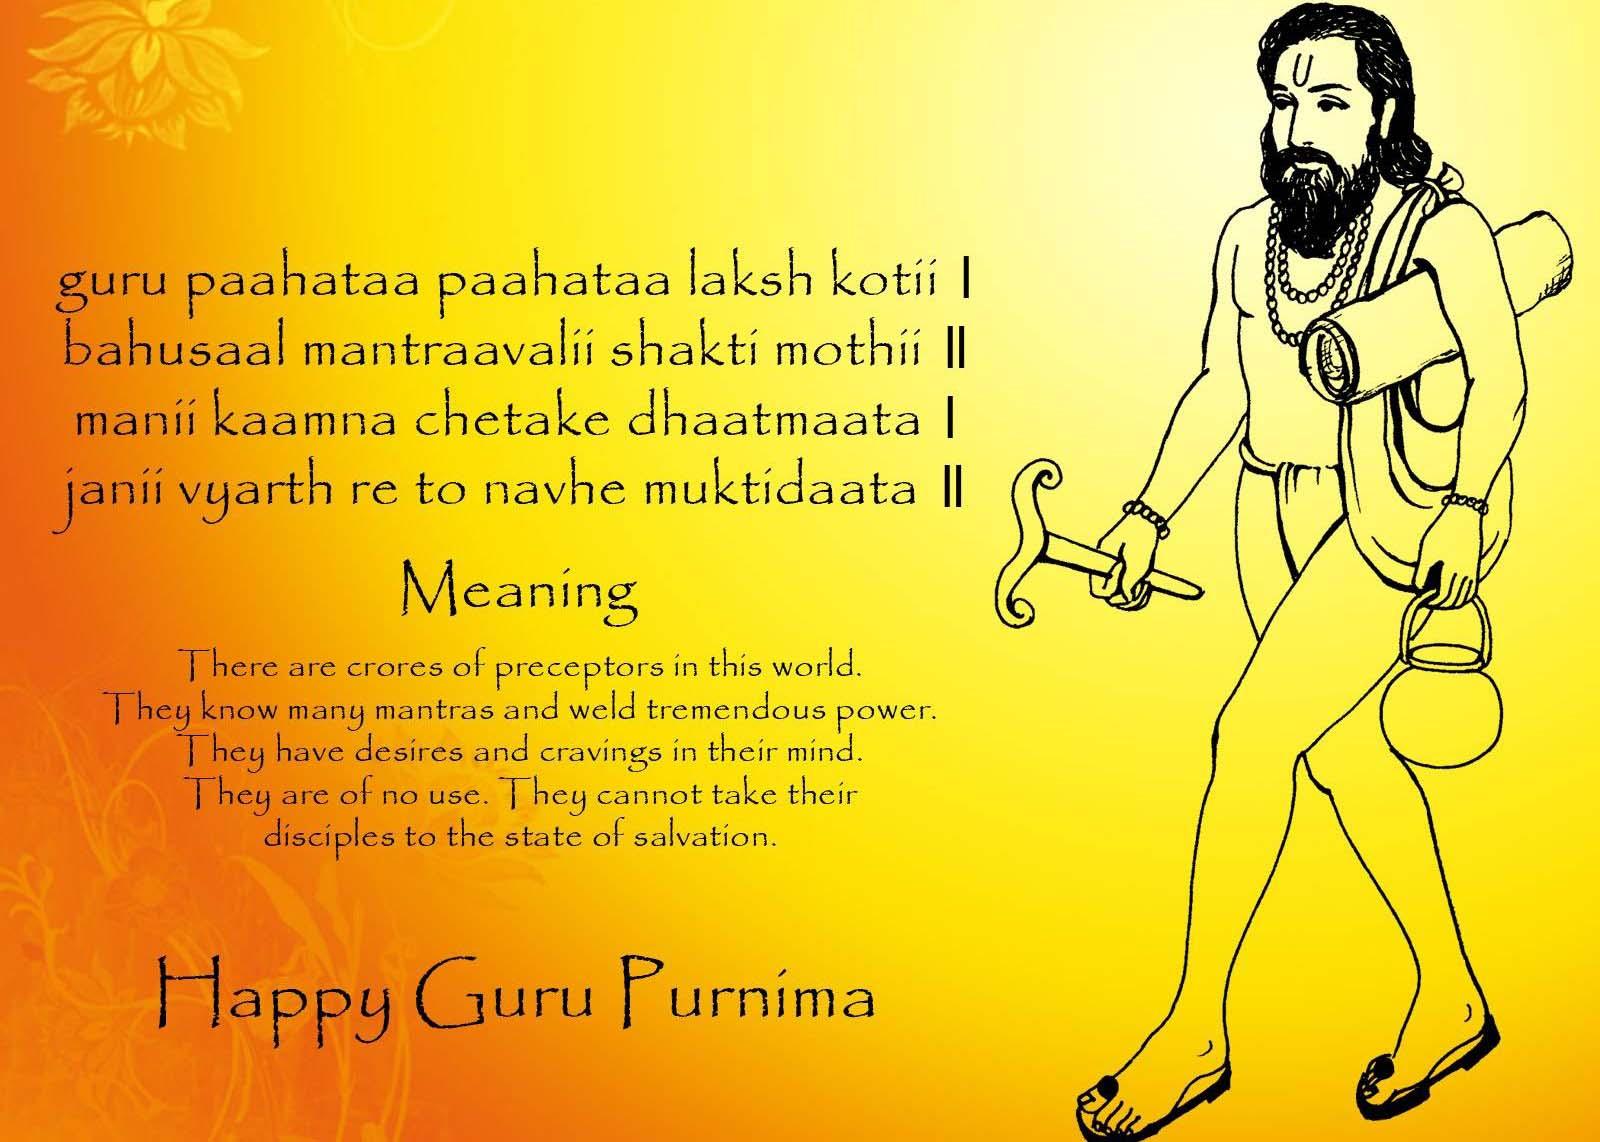 Guru Purnima Wishes Quotes In Hindi Marathi